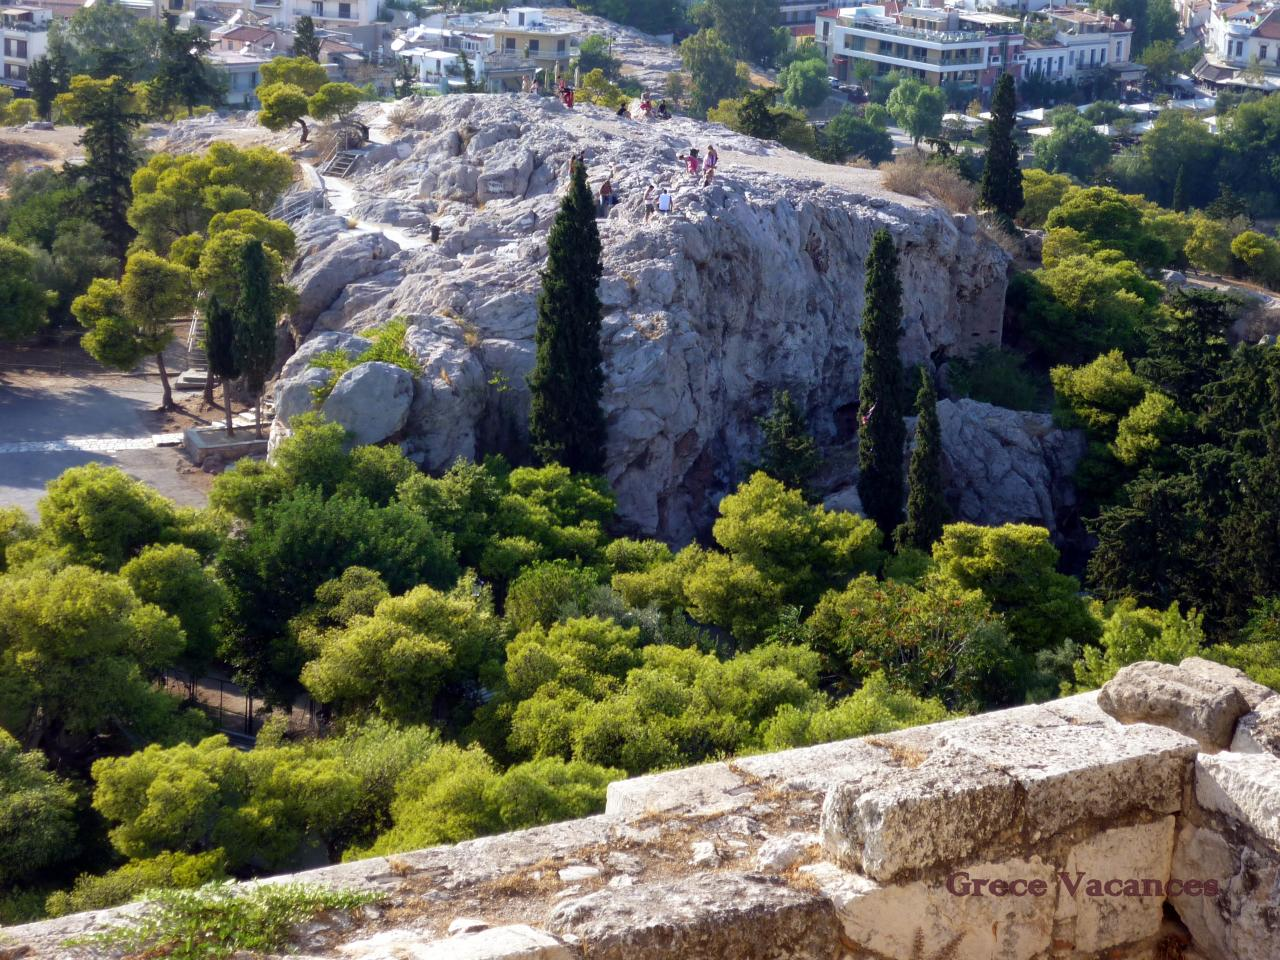 Acropole Areopage -P1020454-GV